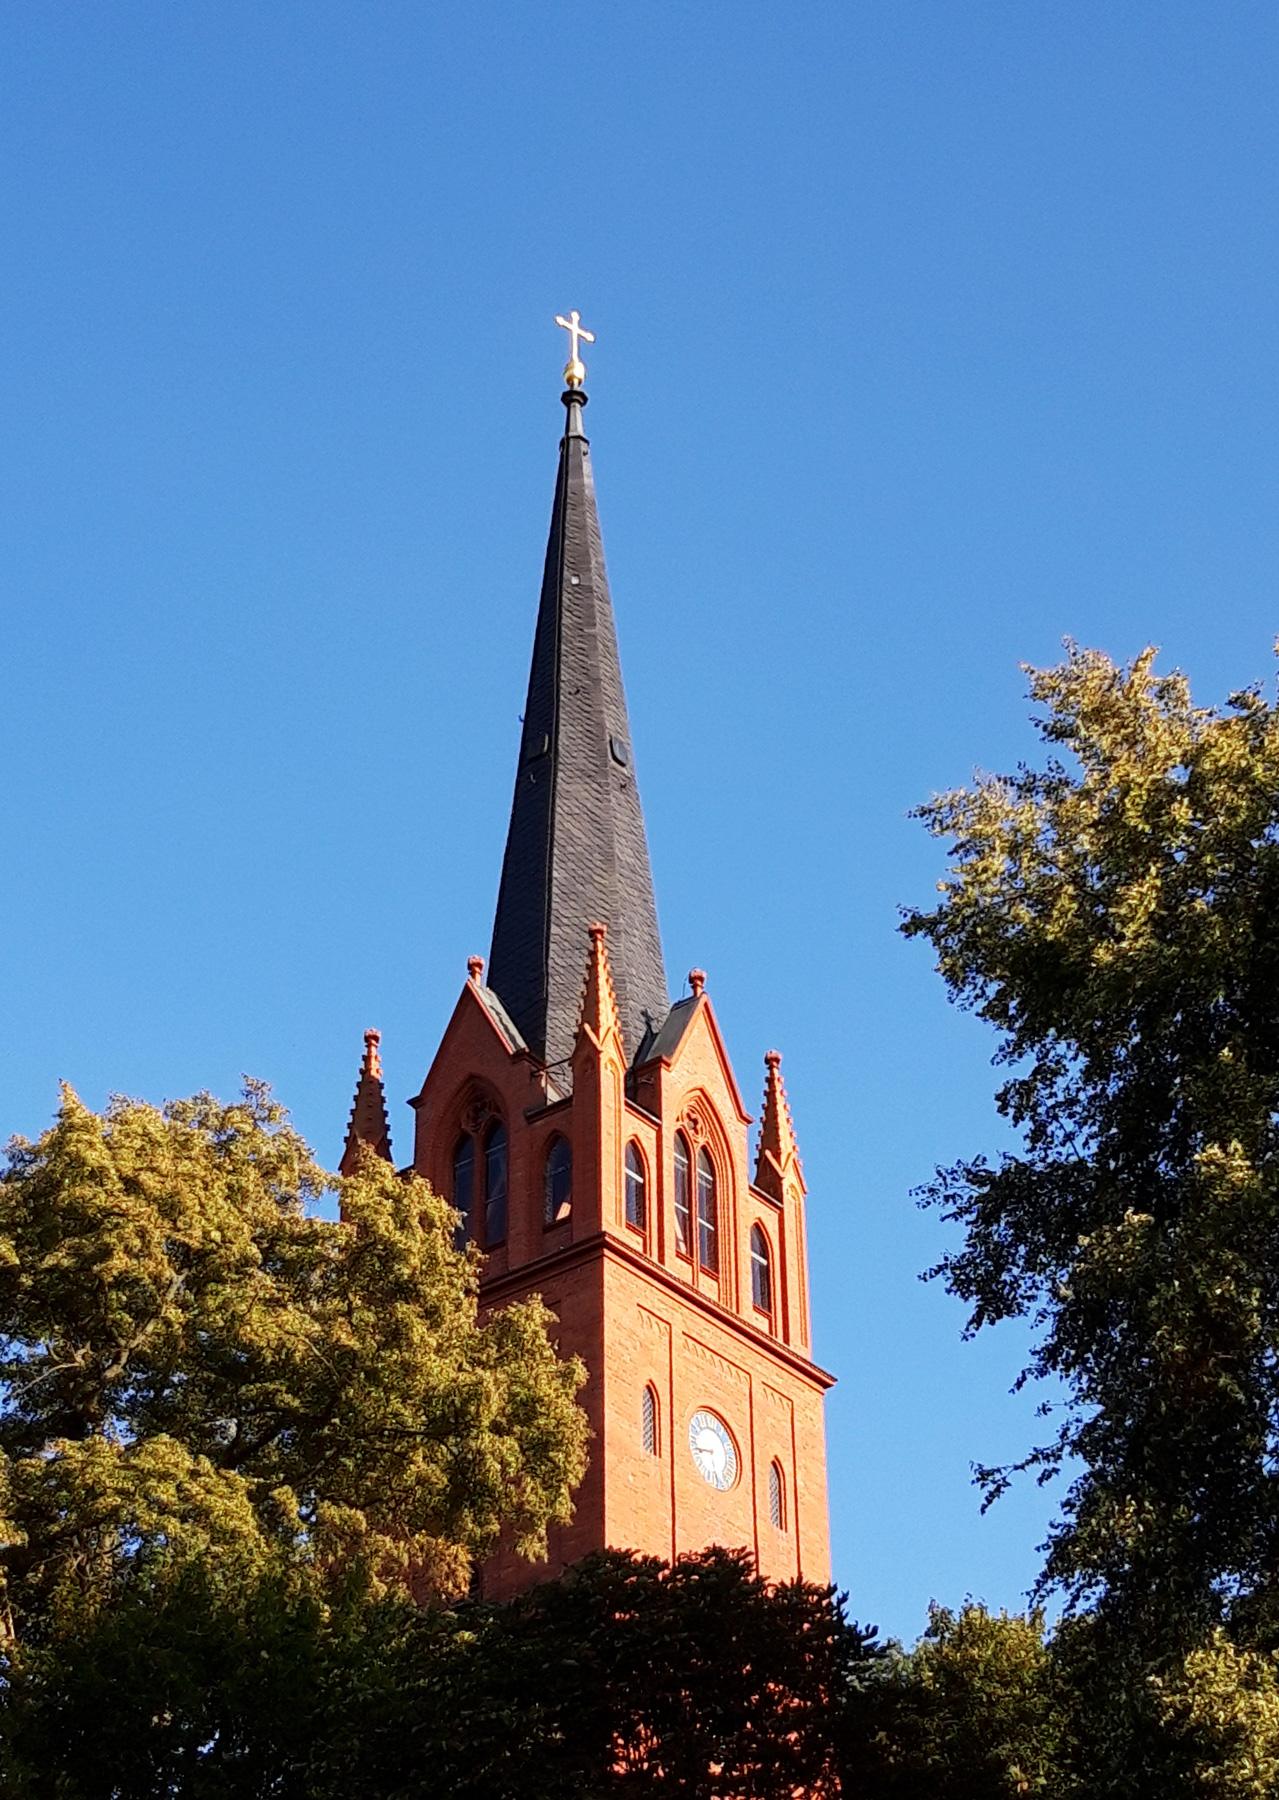 Die berühmte Stülerkirche direkt oberhalb der Pension